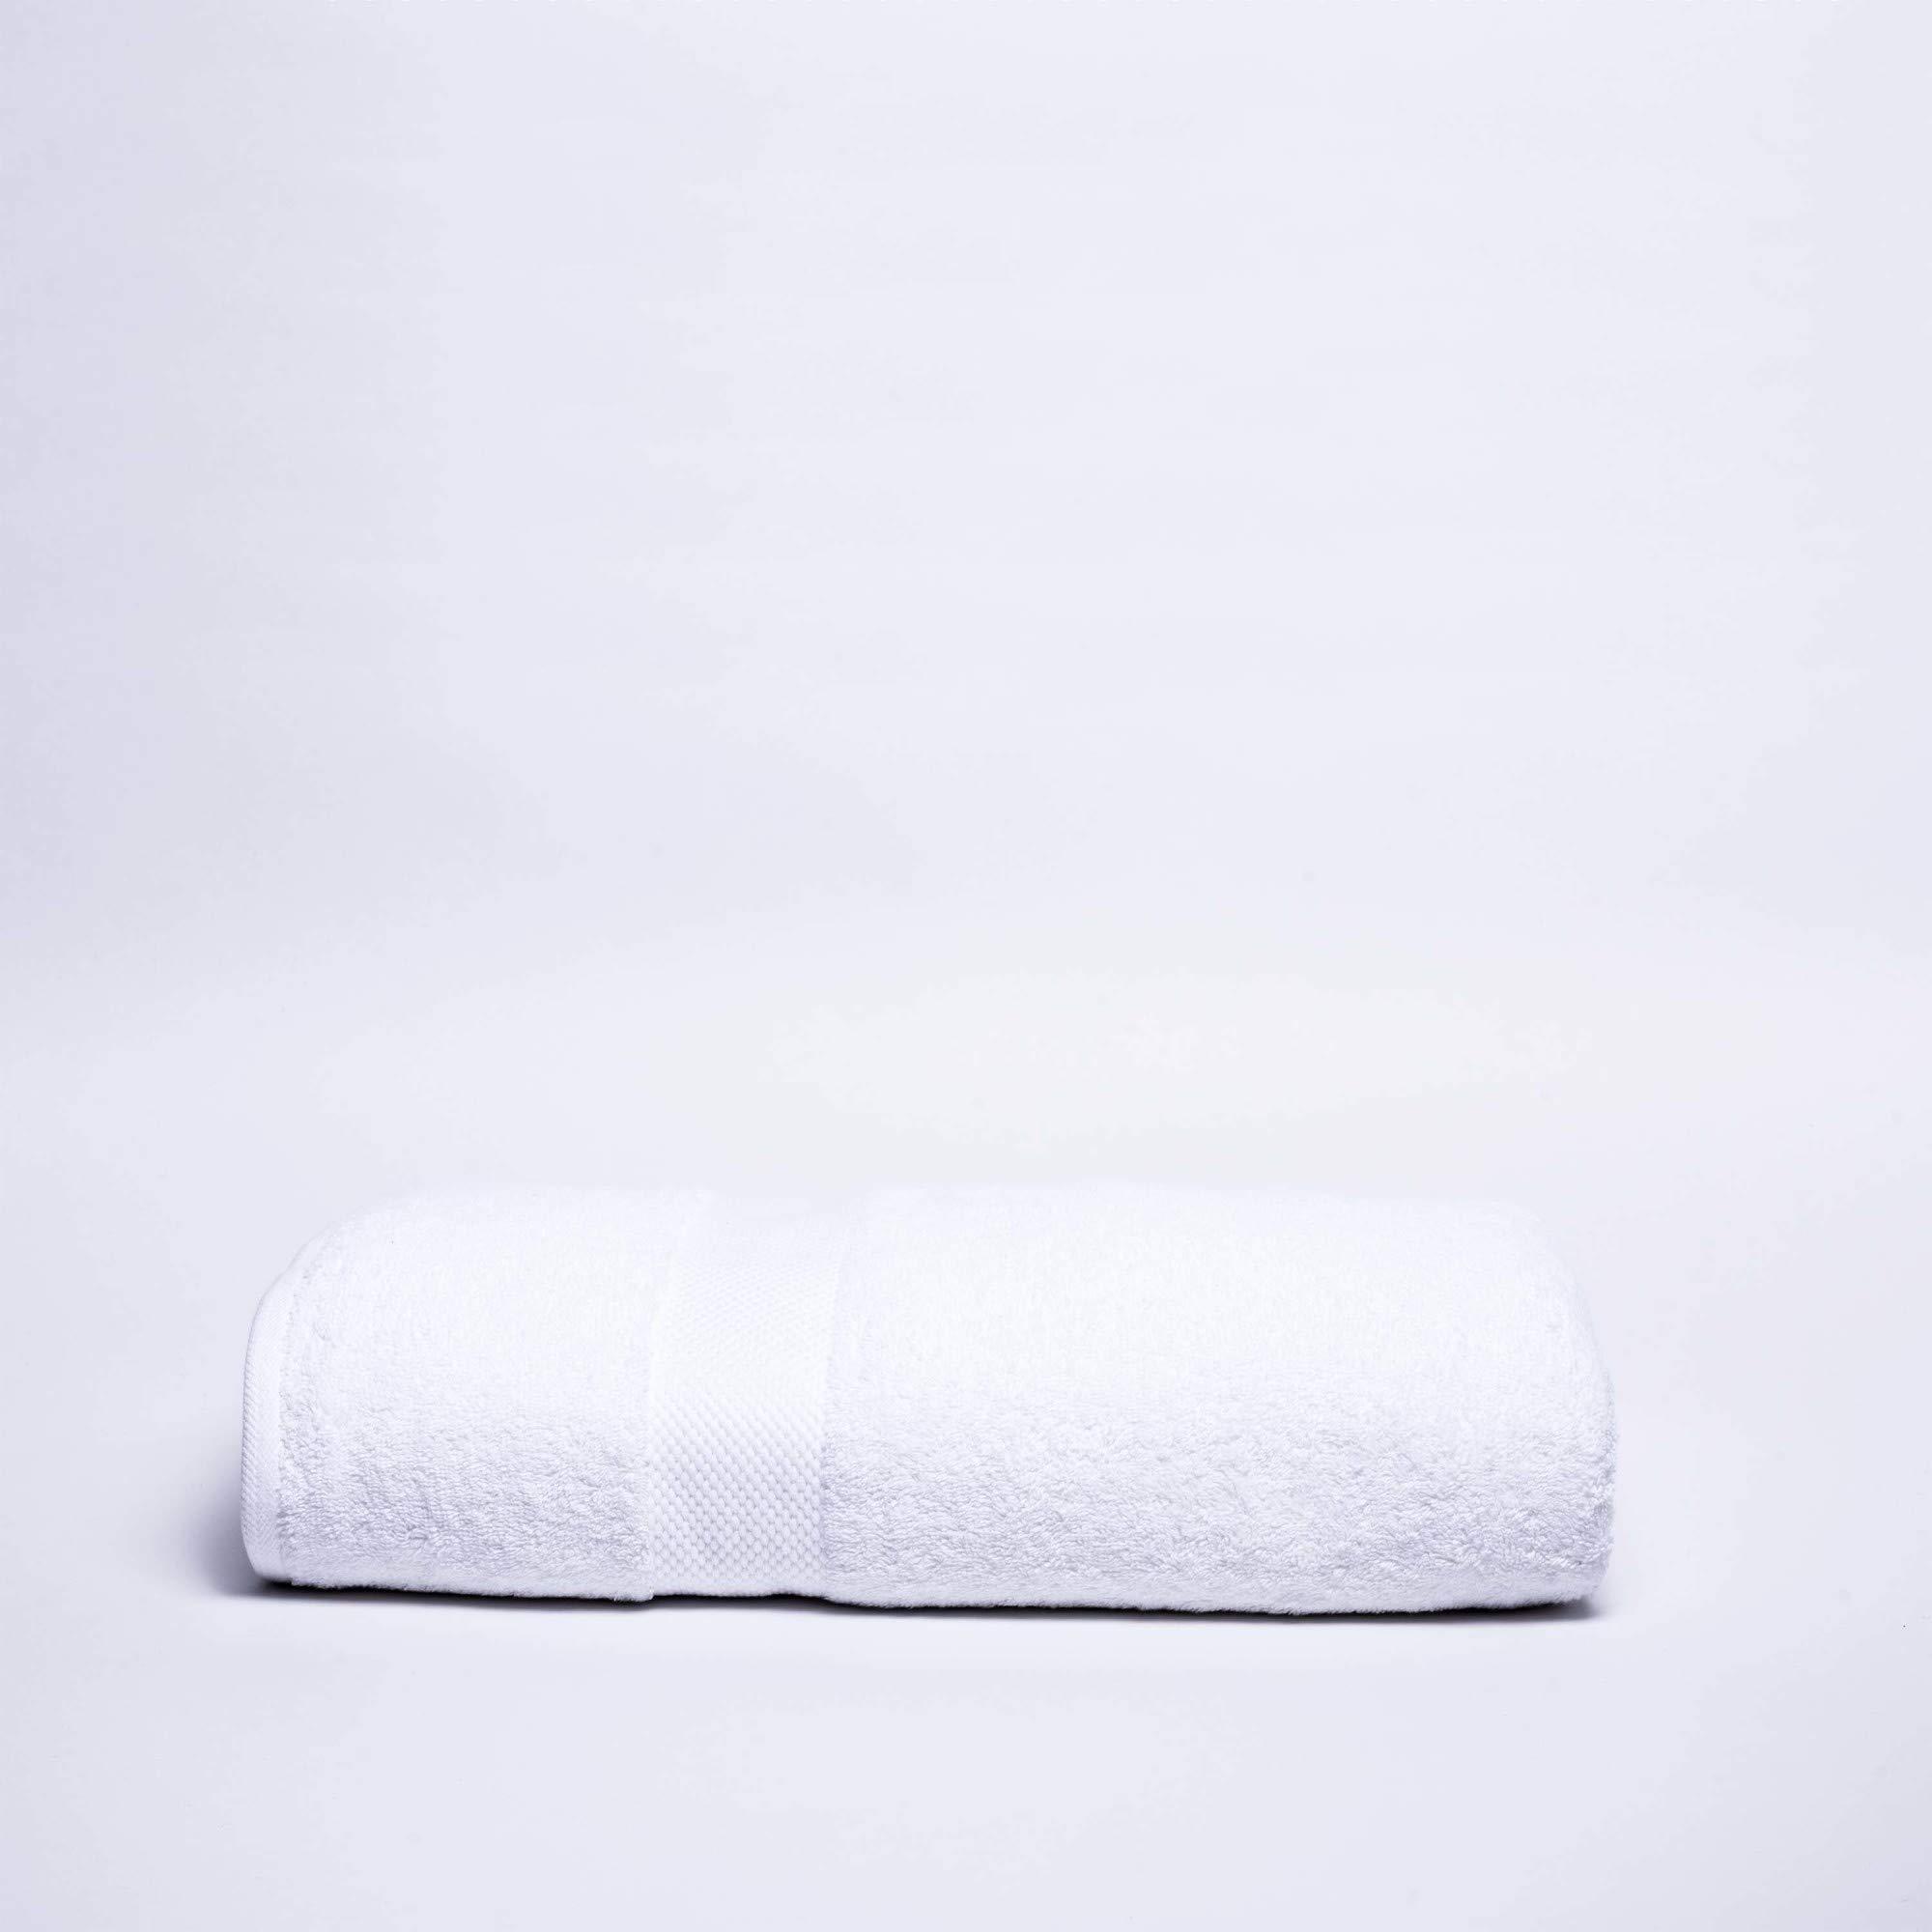 Martex Deluxe Bath Sheet, 36'' W x 72'' L, Optical White